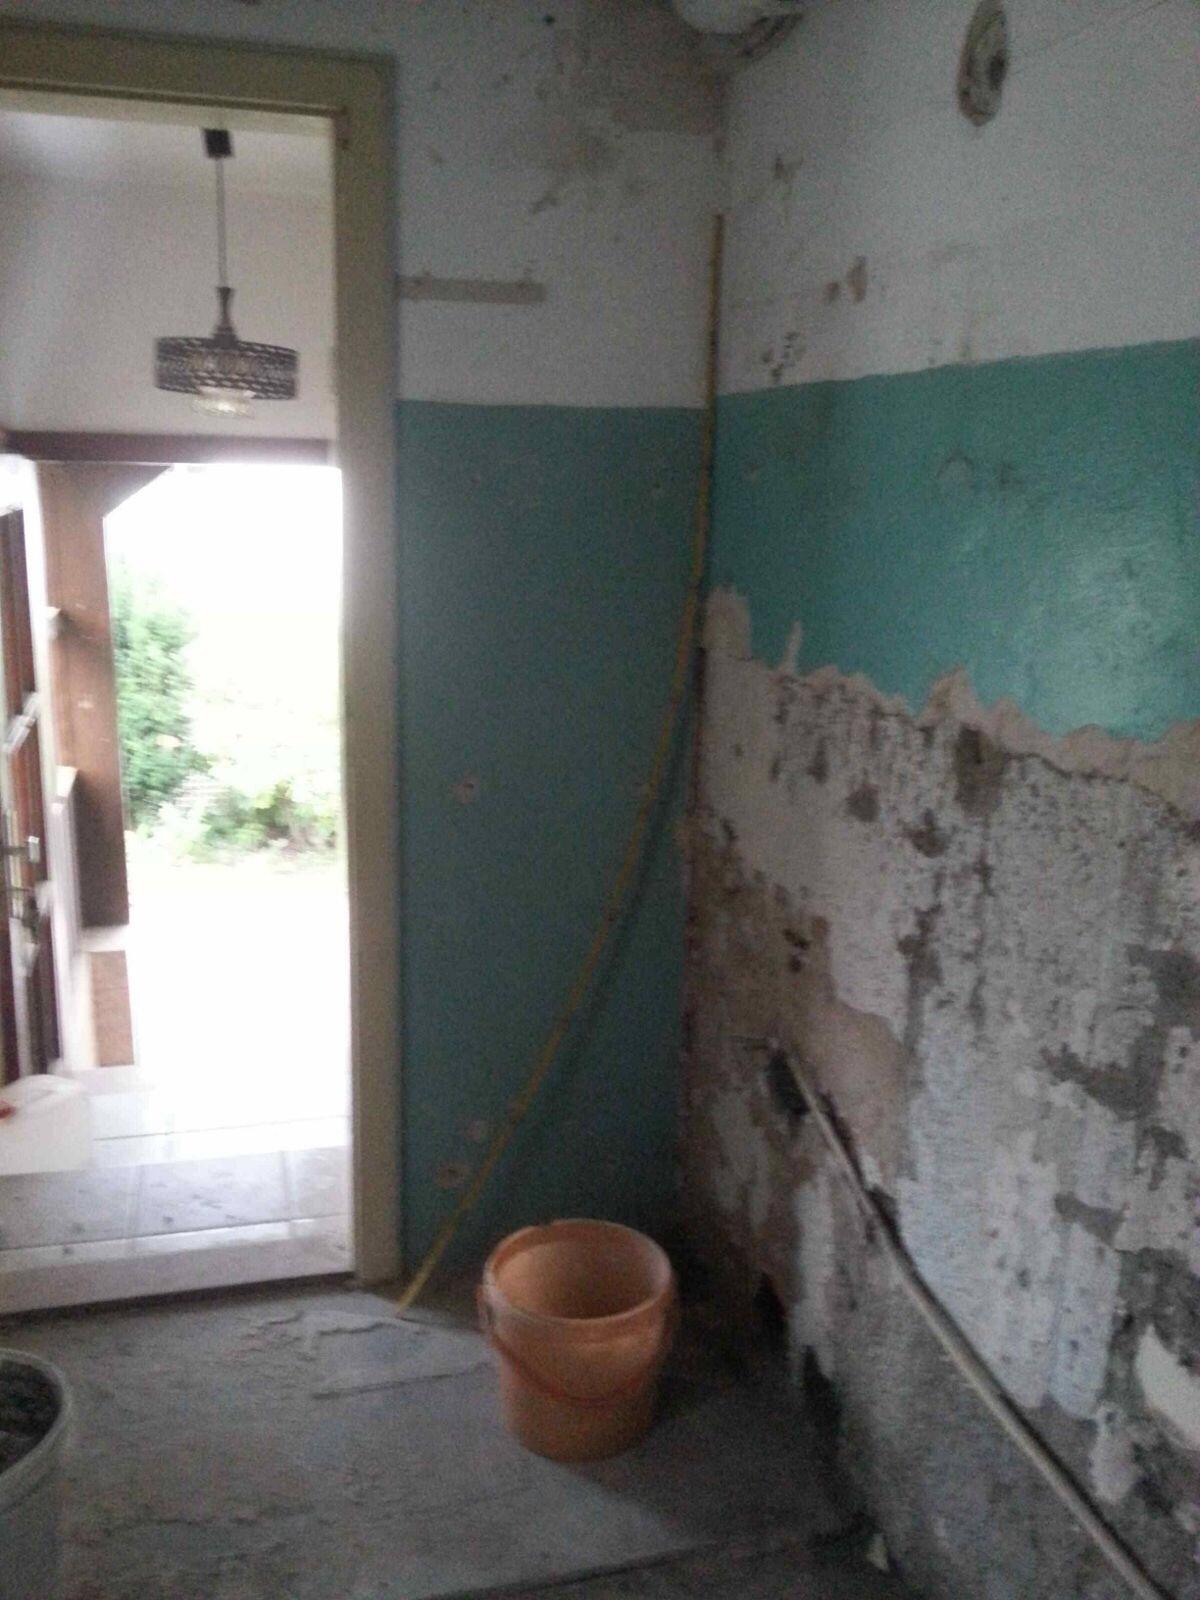 gebr der gehl sanitaer badezimmer aus alt mach neu. Black Bedroom Furniture Sets. Home Design Ideas